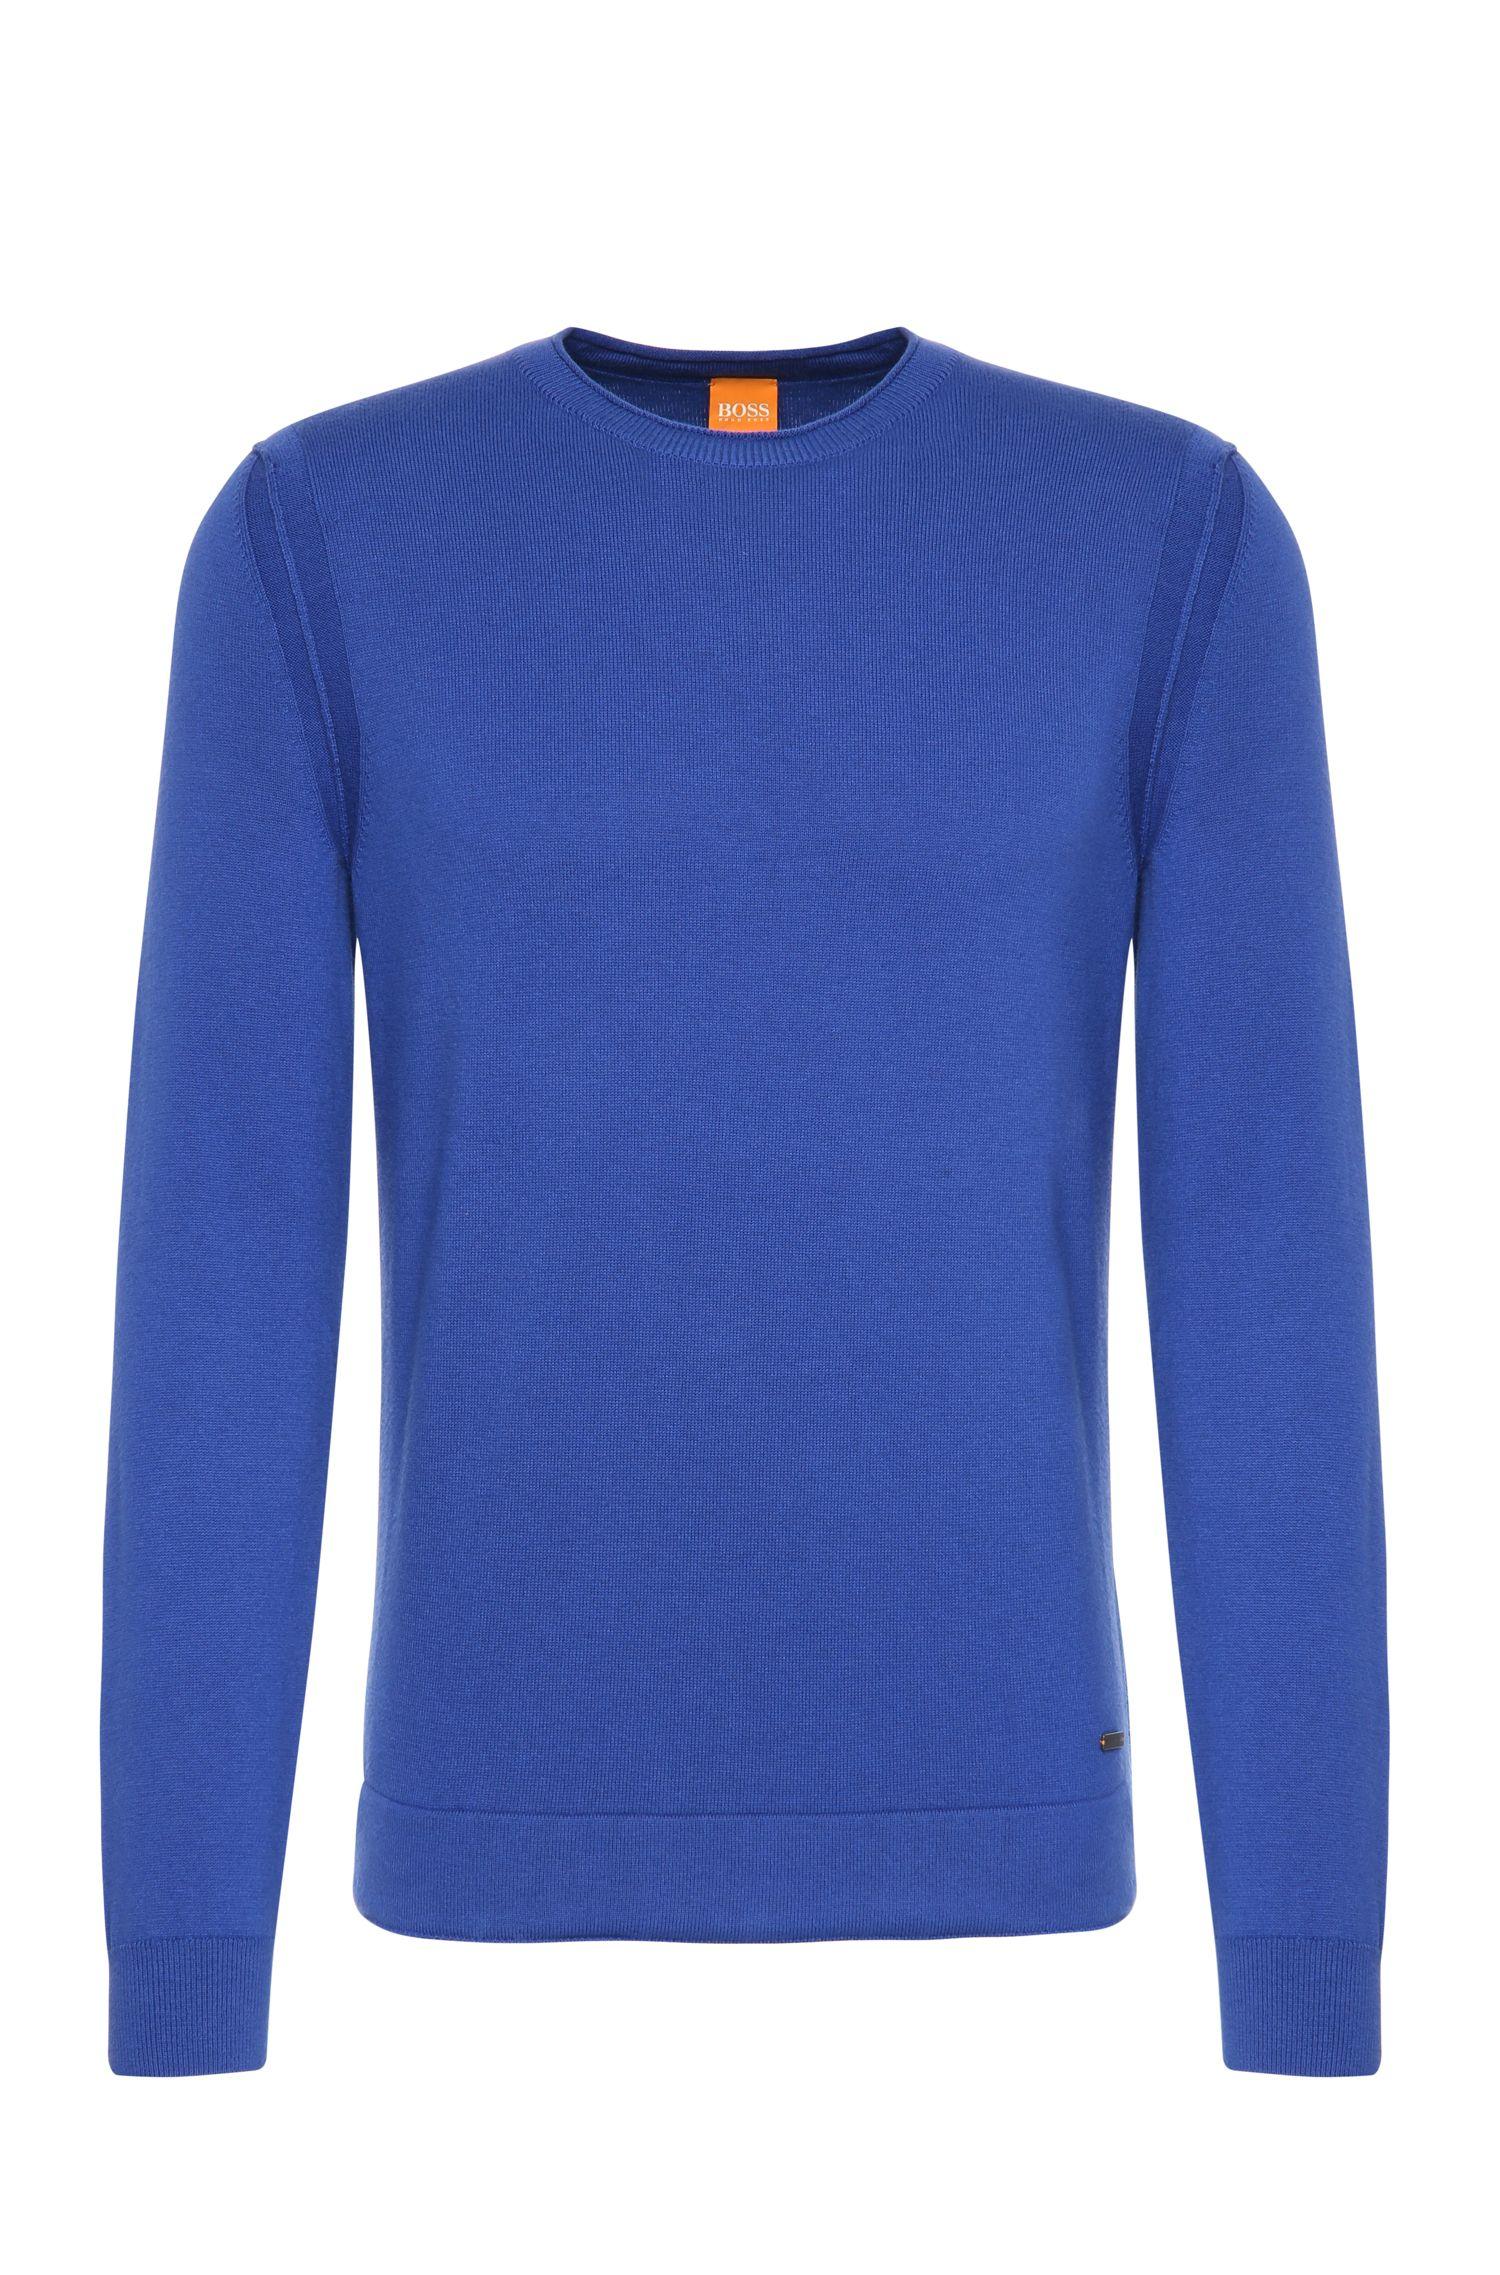 'Albion' | Virgin Wool Cotton Blend Sweater